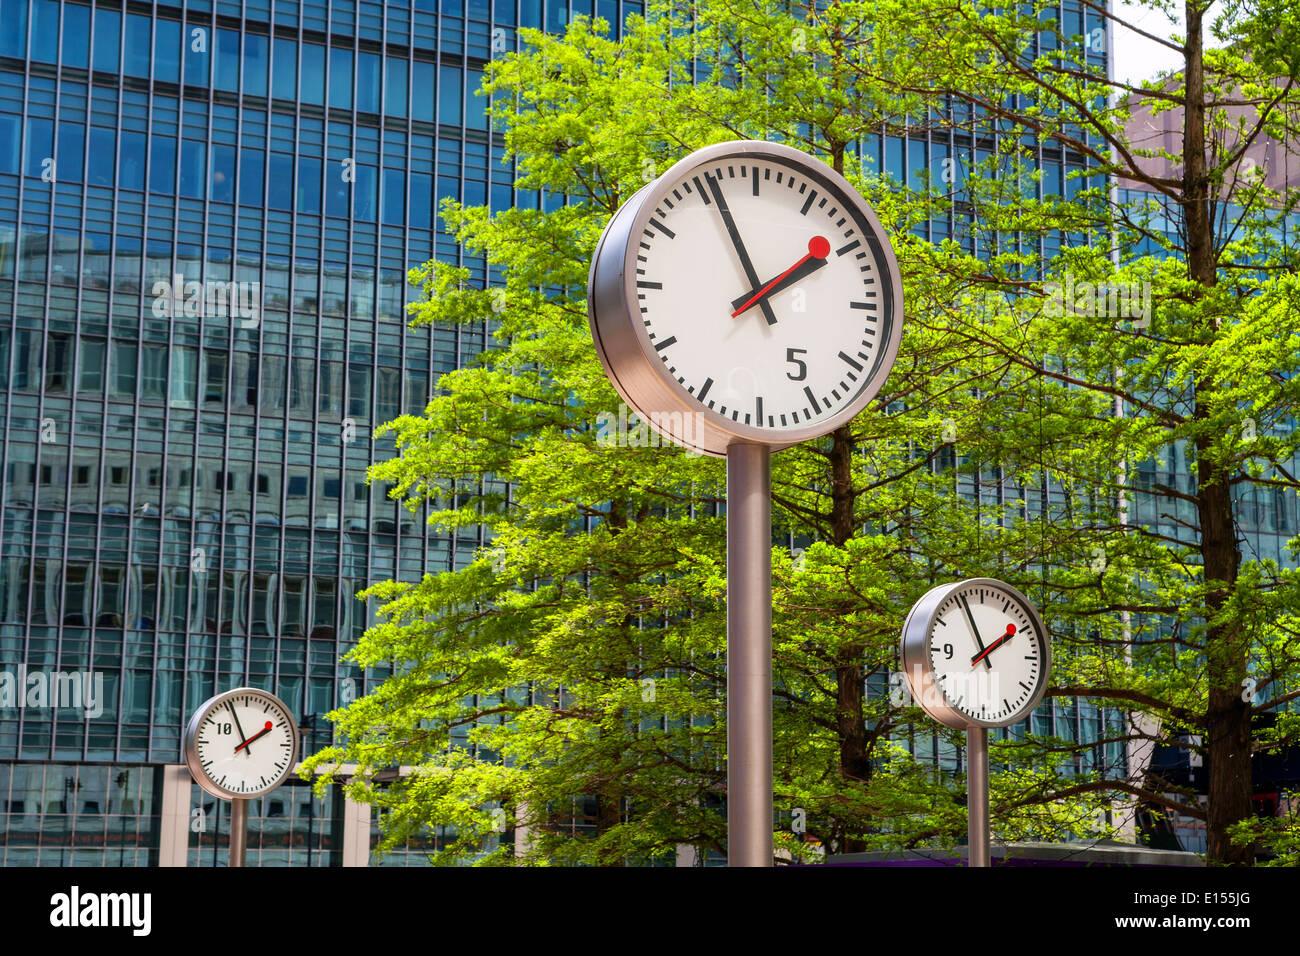 Canary Wharf Clocks. London, UK - Stock Image